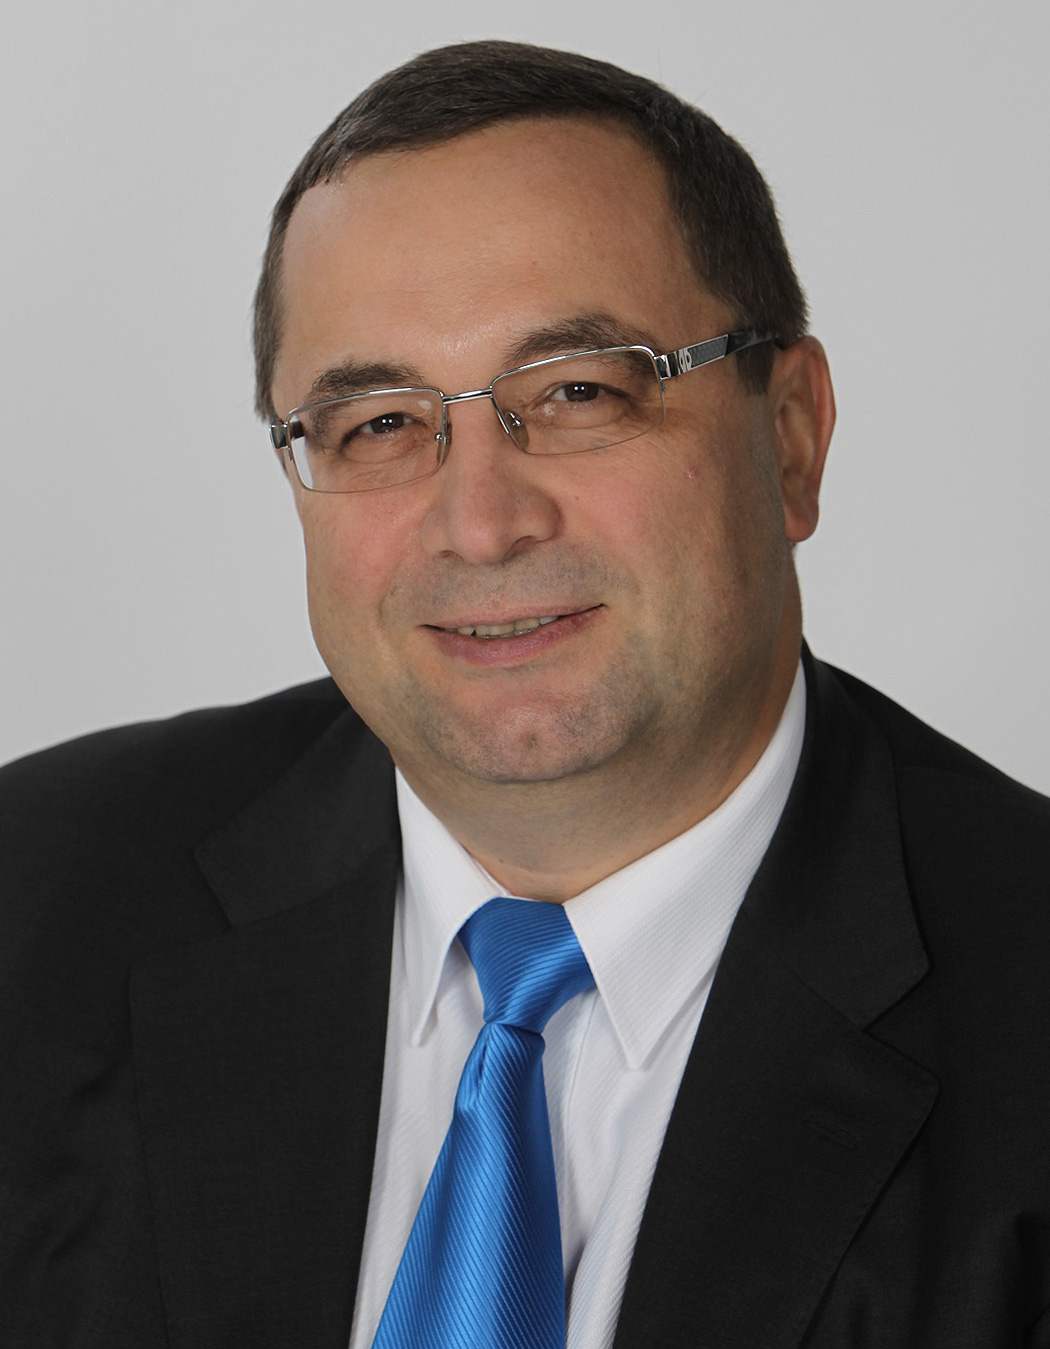 Самсонов Роман, модератор пленарного заседания OMR 2018